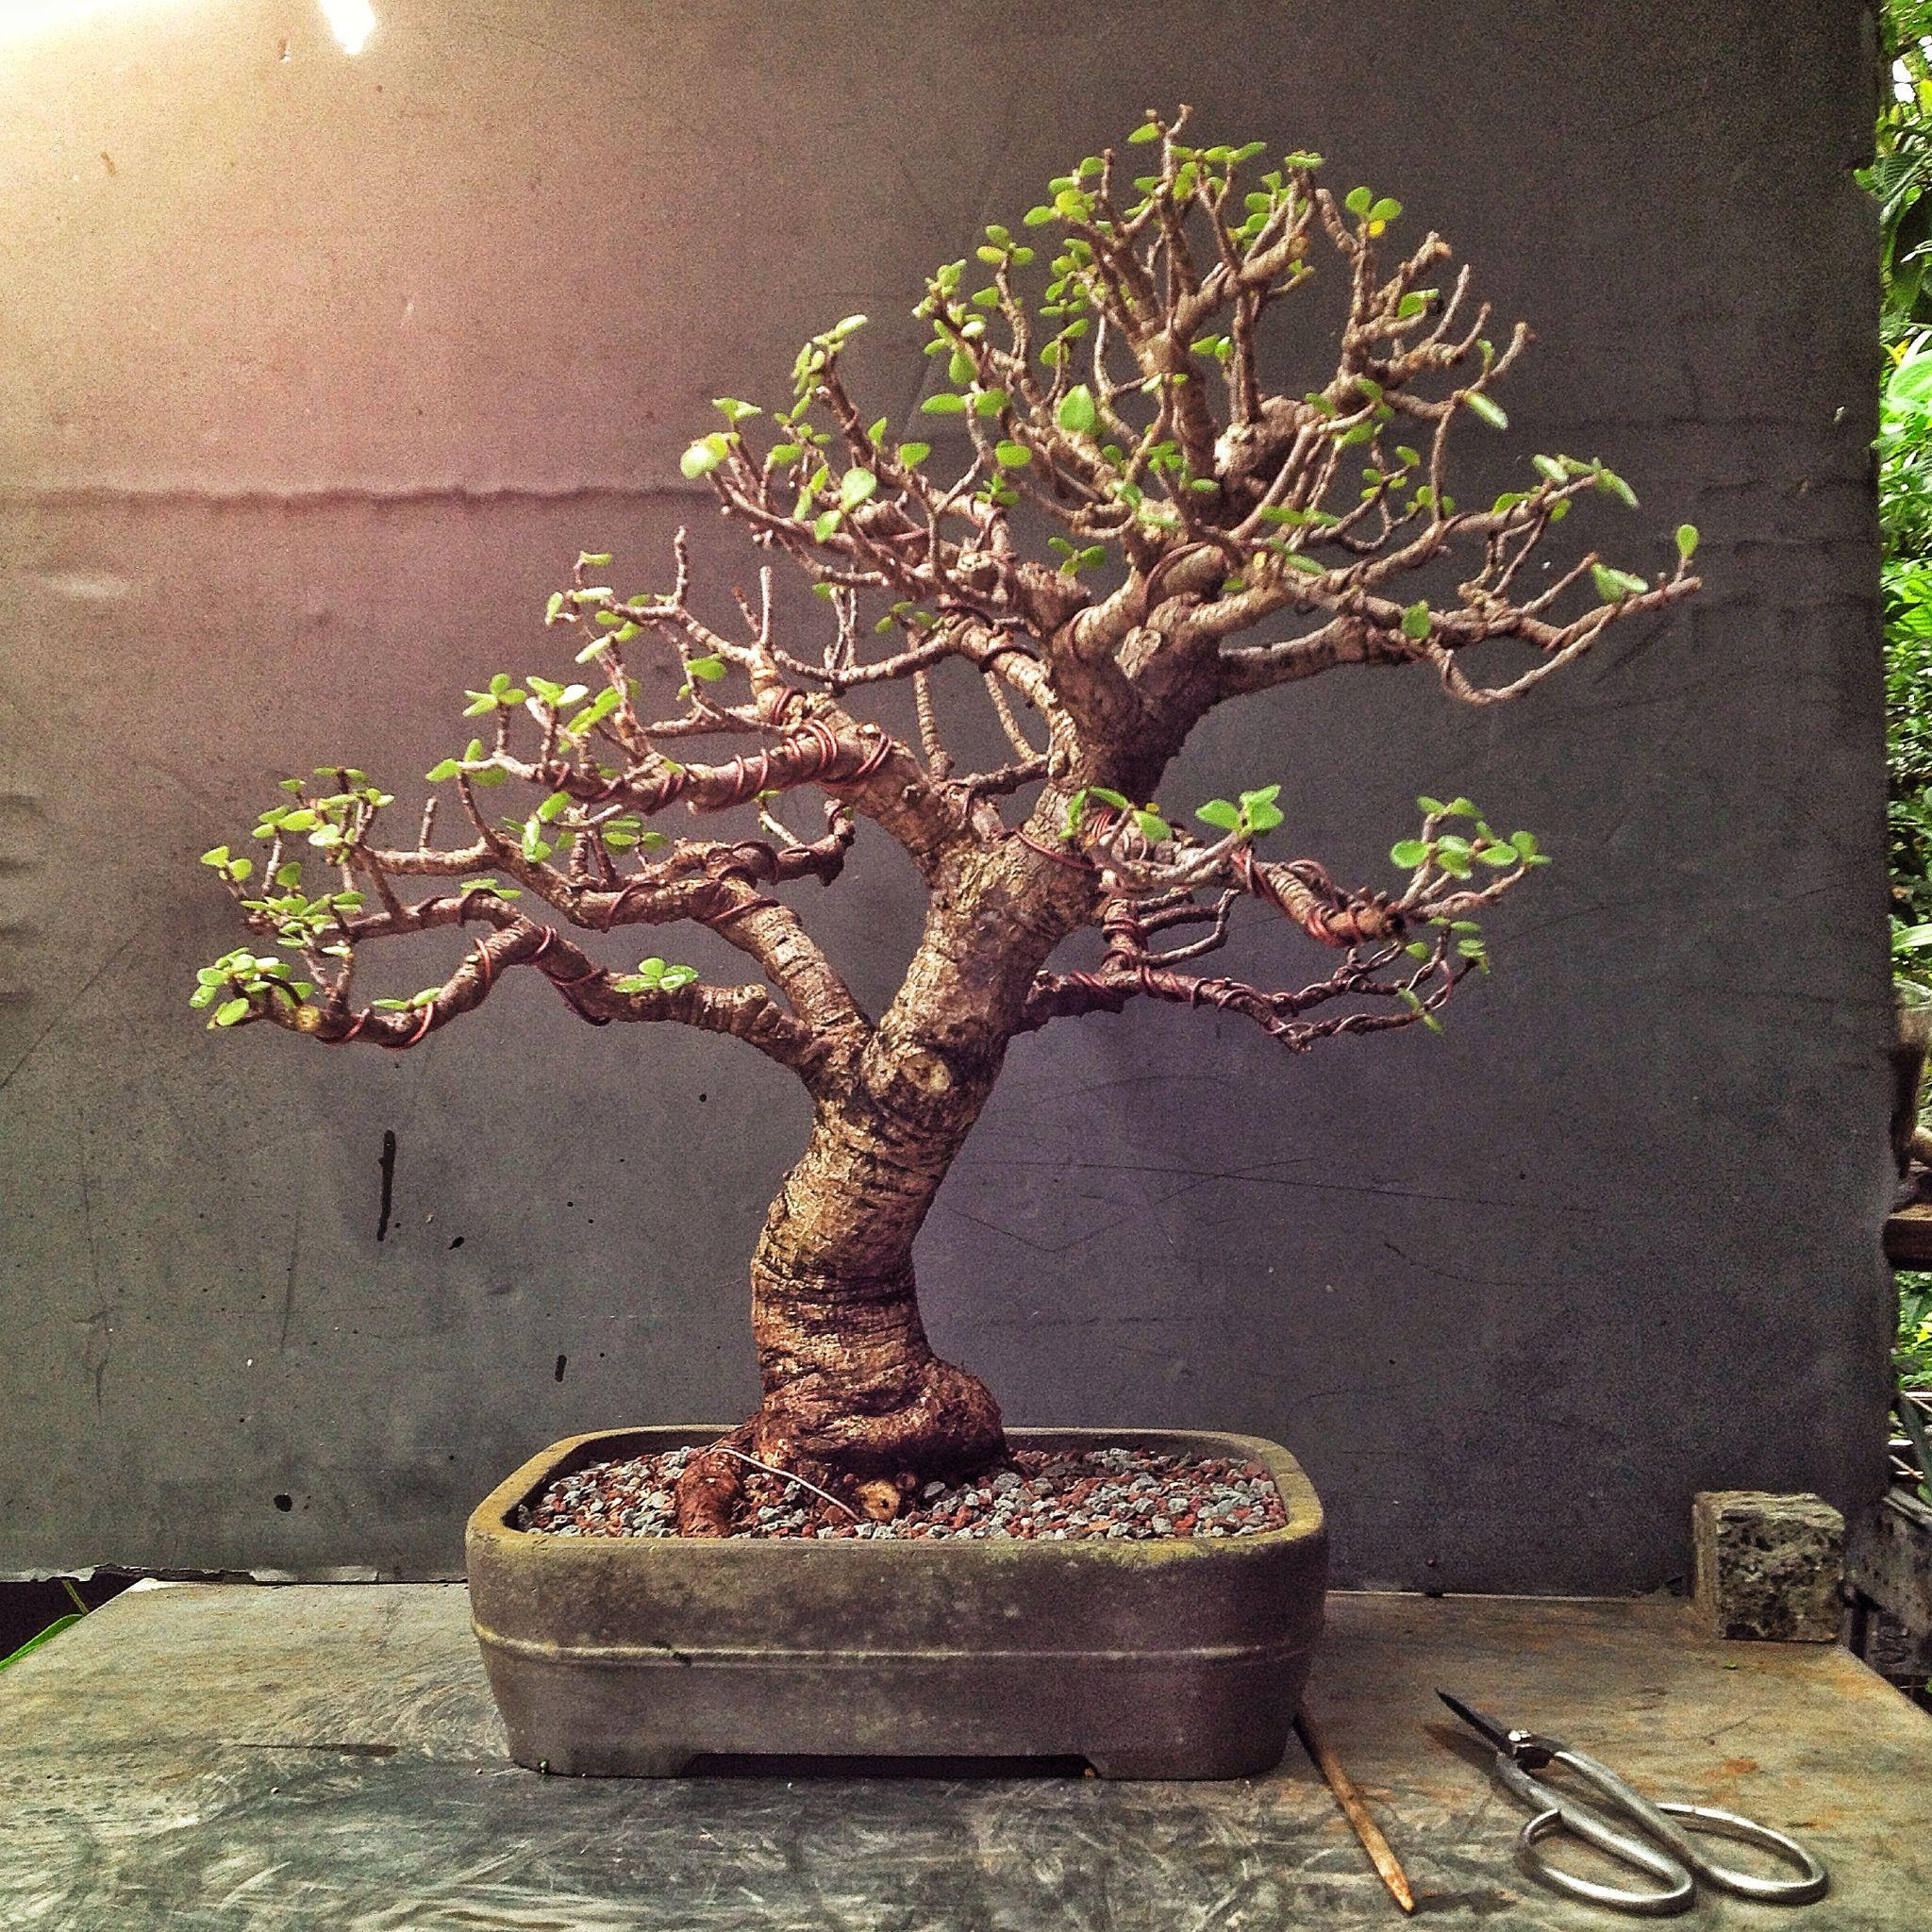 Marvelous Dwarf Jade Bonsai Techniques Adams Art And Bonsai Blog Gifts Wiring 101 Photwellnesstrialsorg